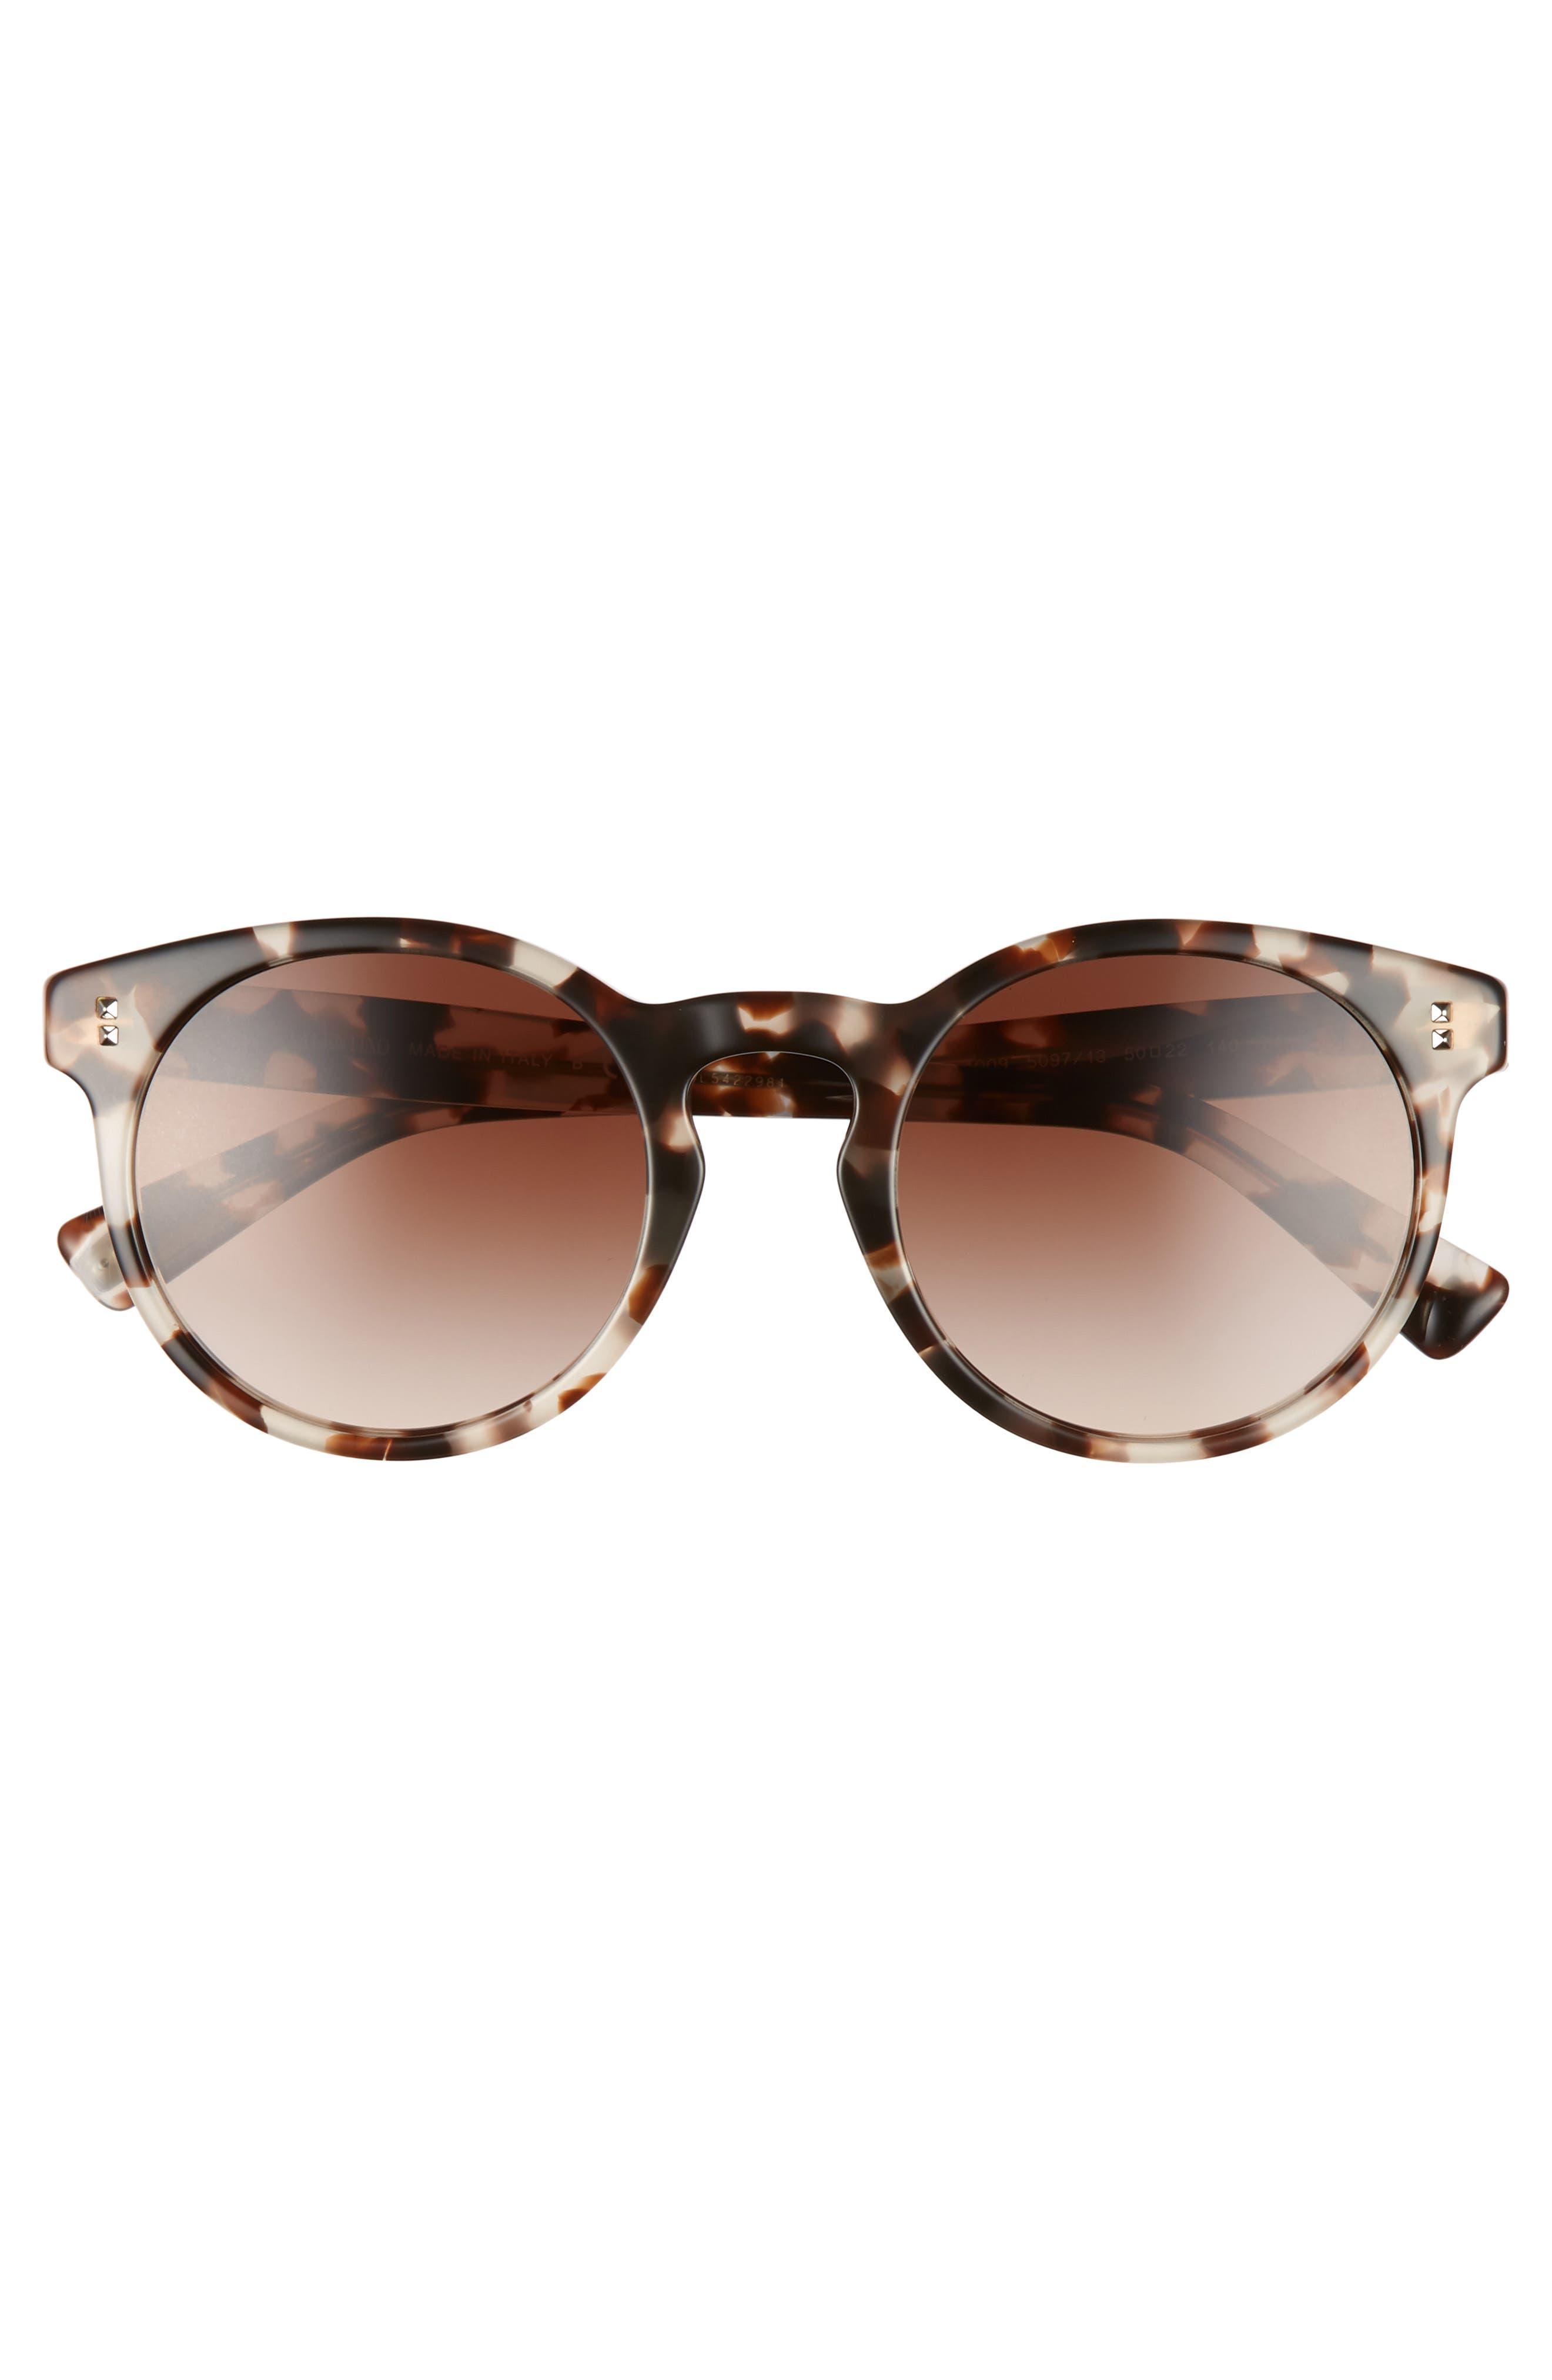 50mm Retro Sunglasses,                             Alternate thumbnail 3, color,                             BEIGE TORTOISE/ BROWN GRADIENT